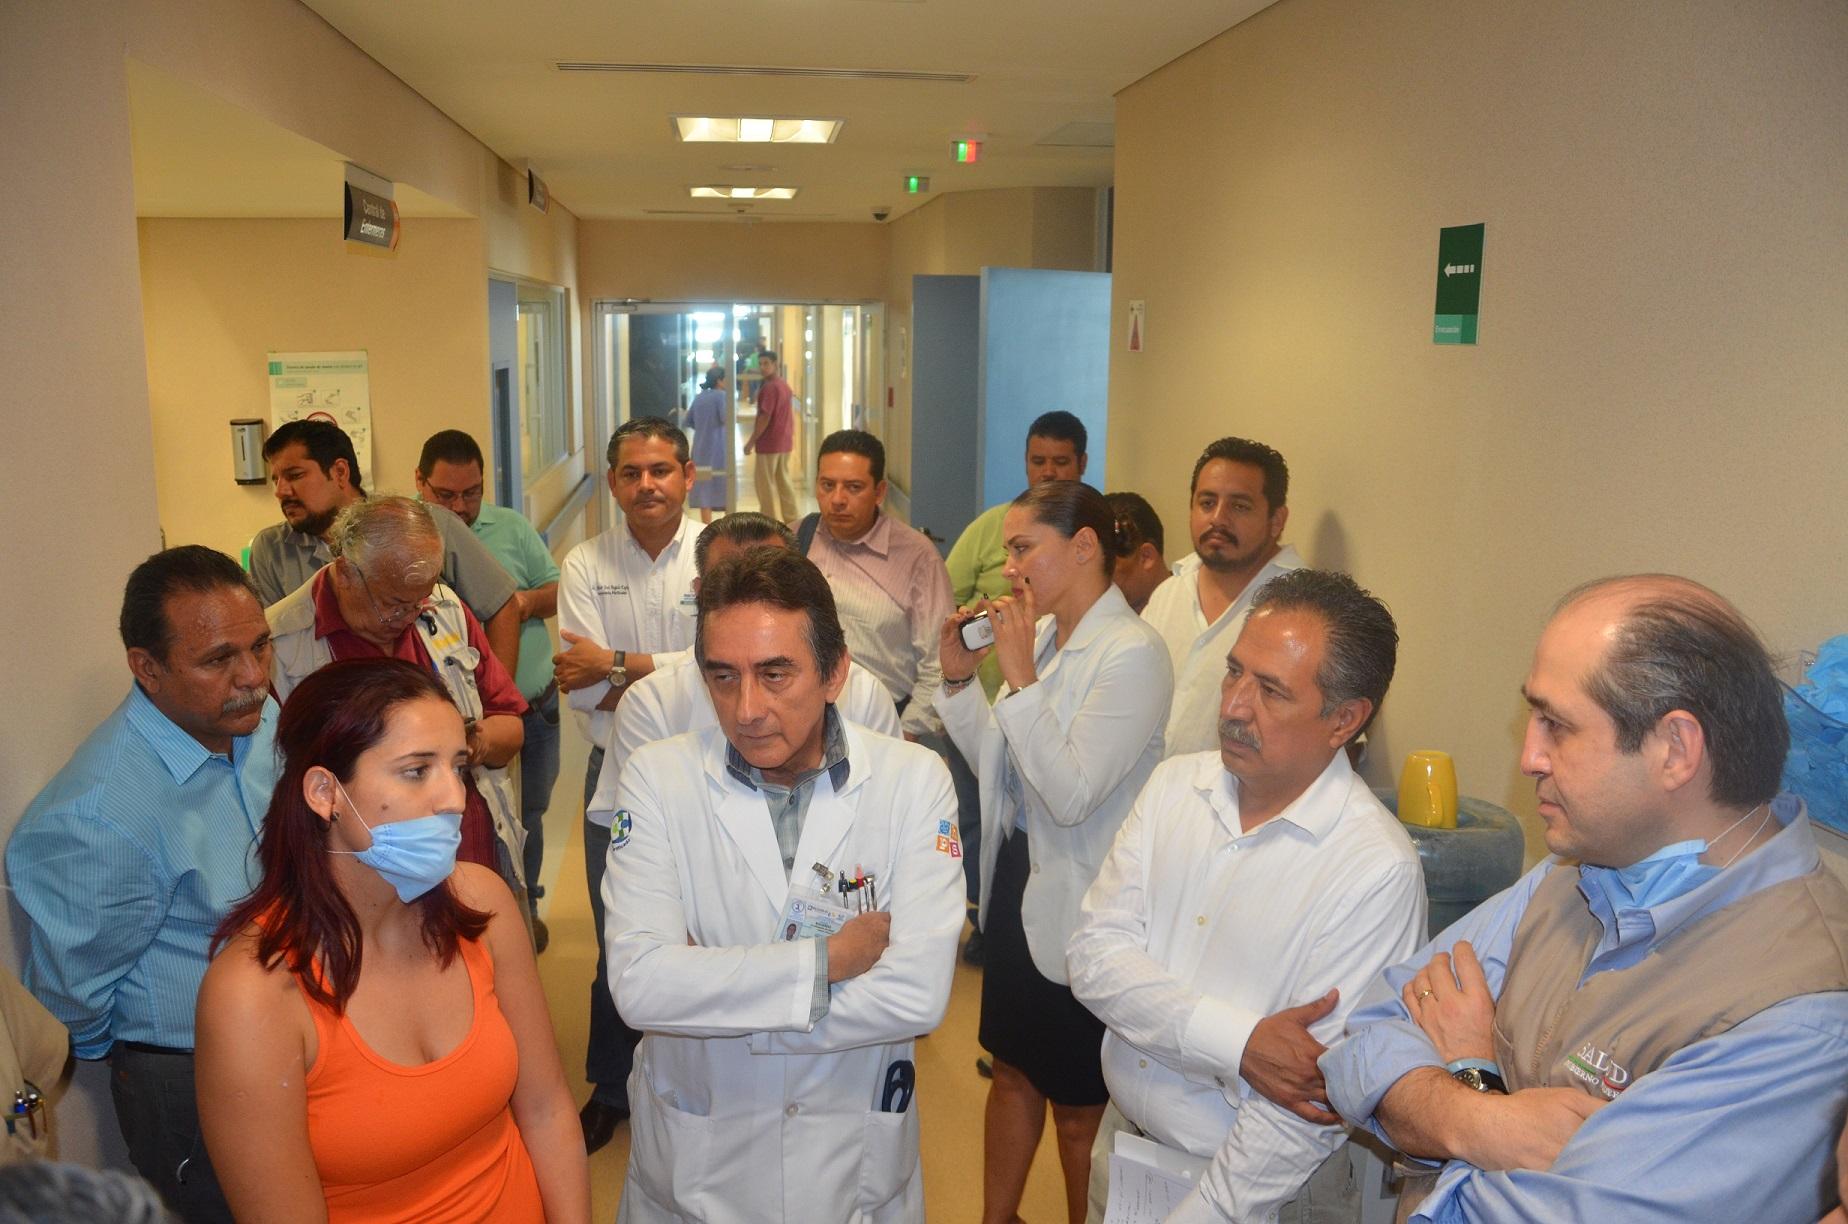 260914 Visita al HospitalJuan Maria de Salvatierra 05jpg